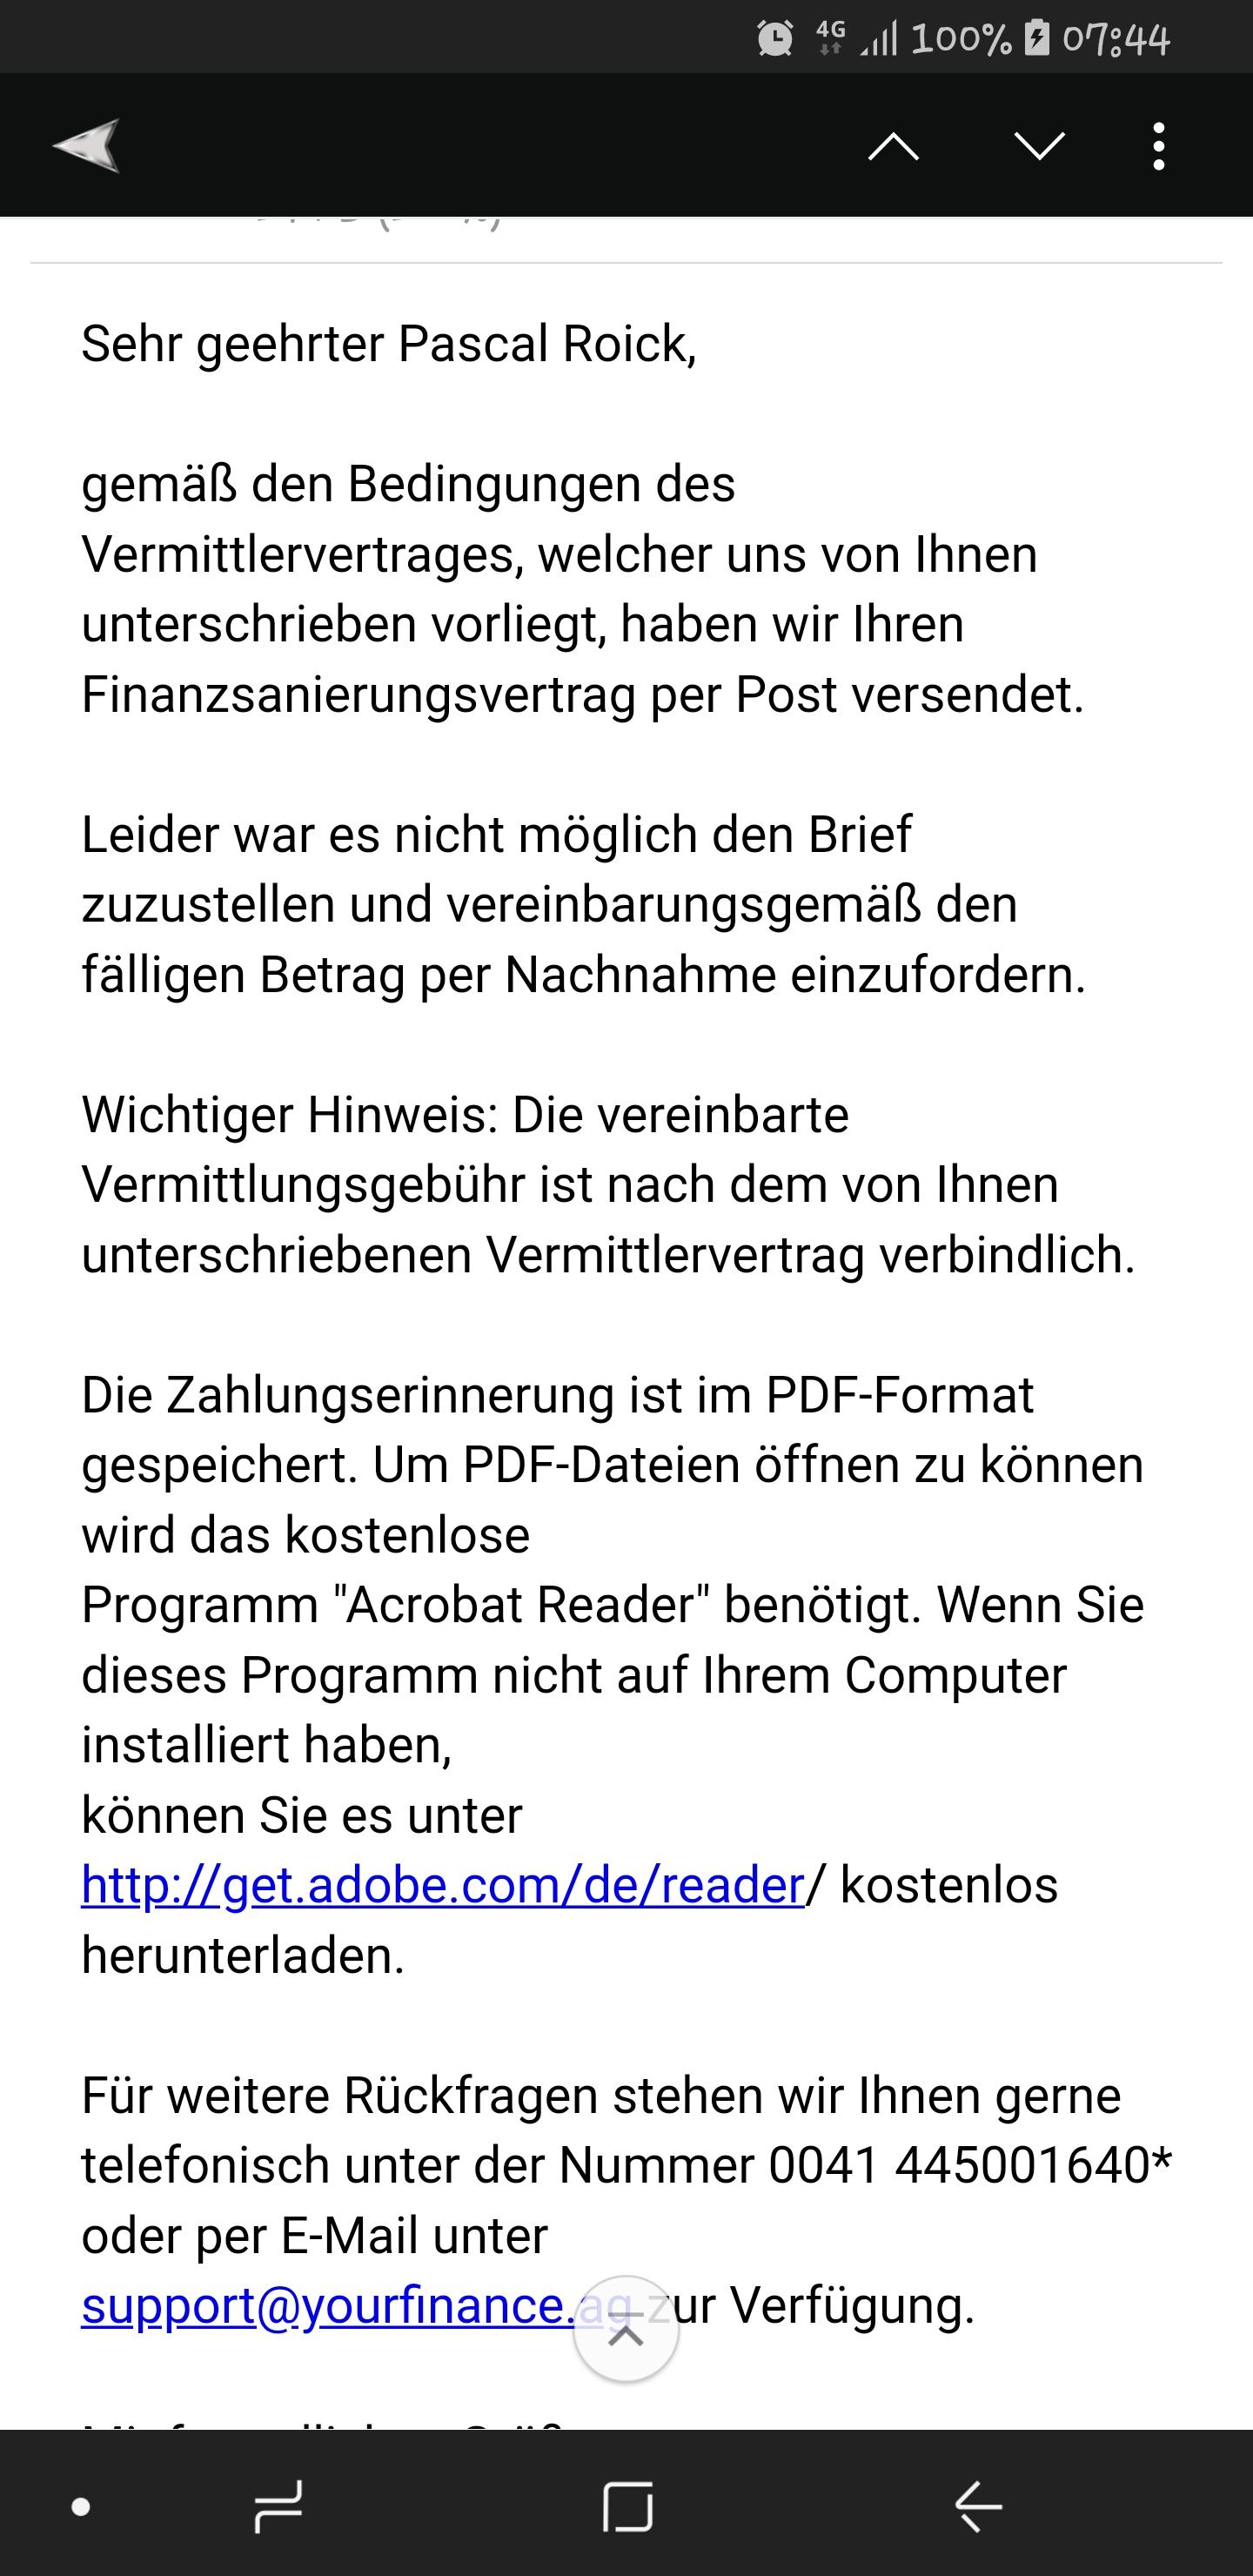 Your Finance Ag Erfahrungsberichte